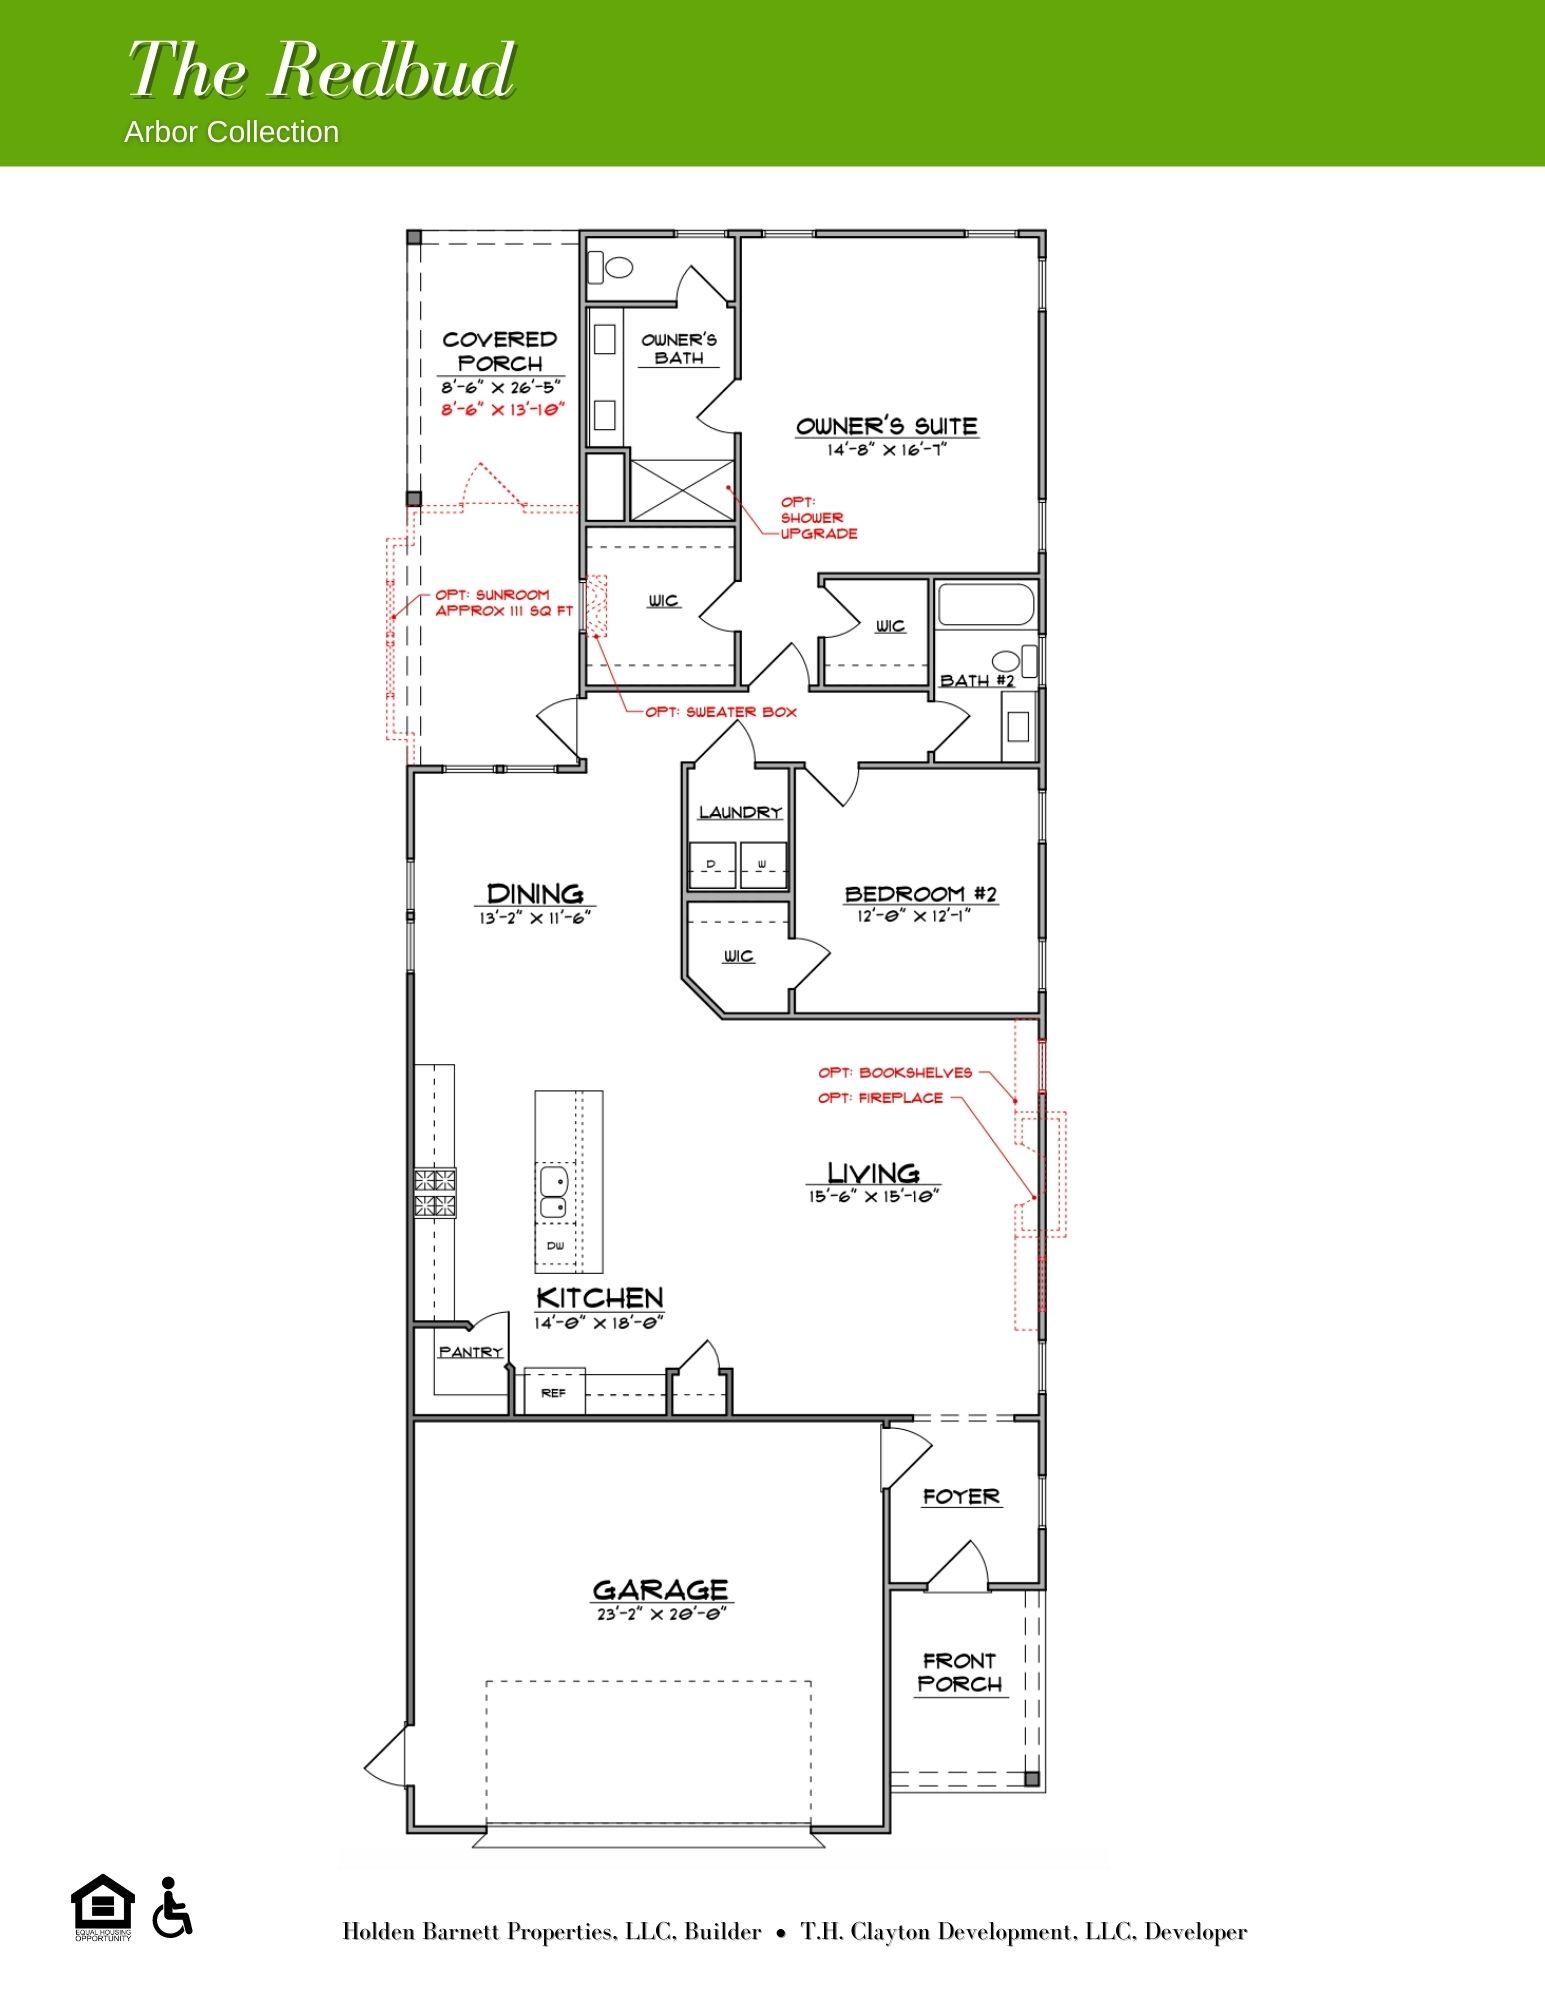 The Redbud First Floor Floorplan